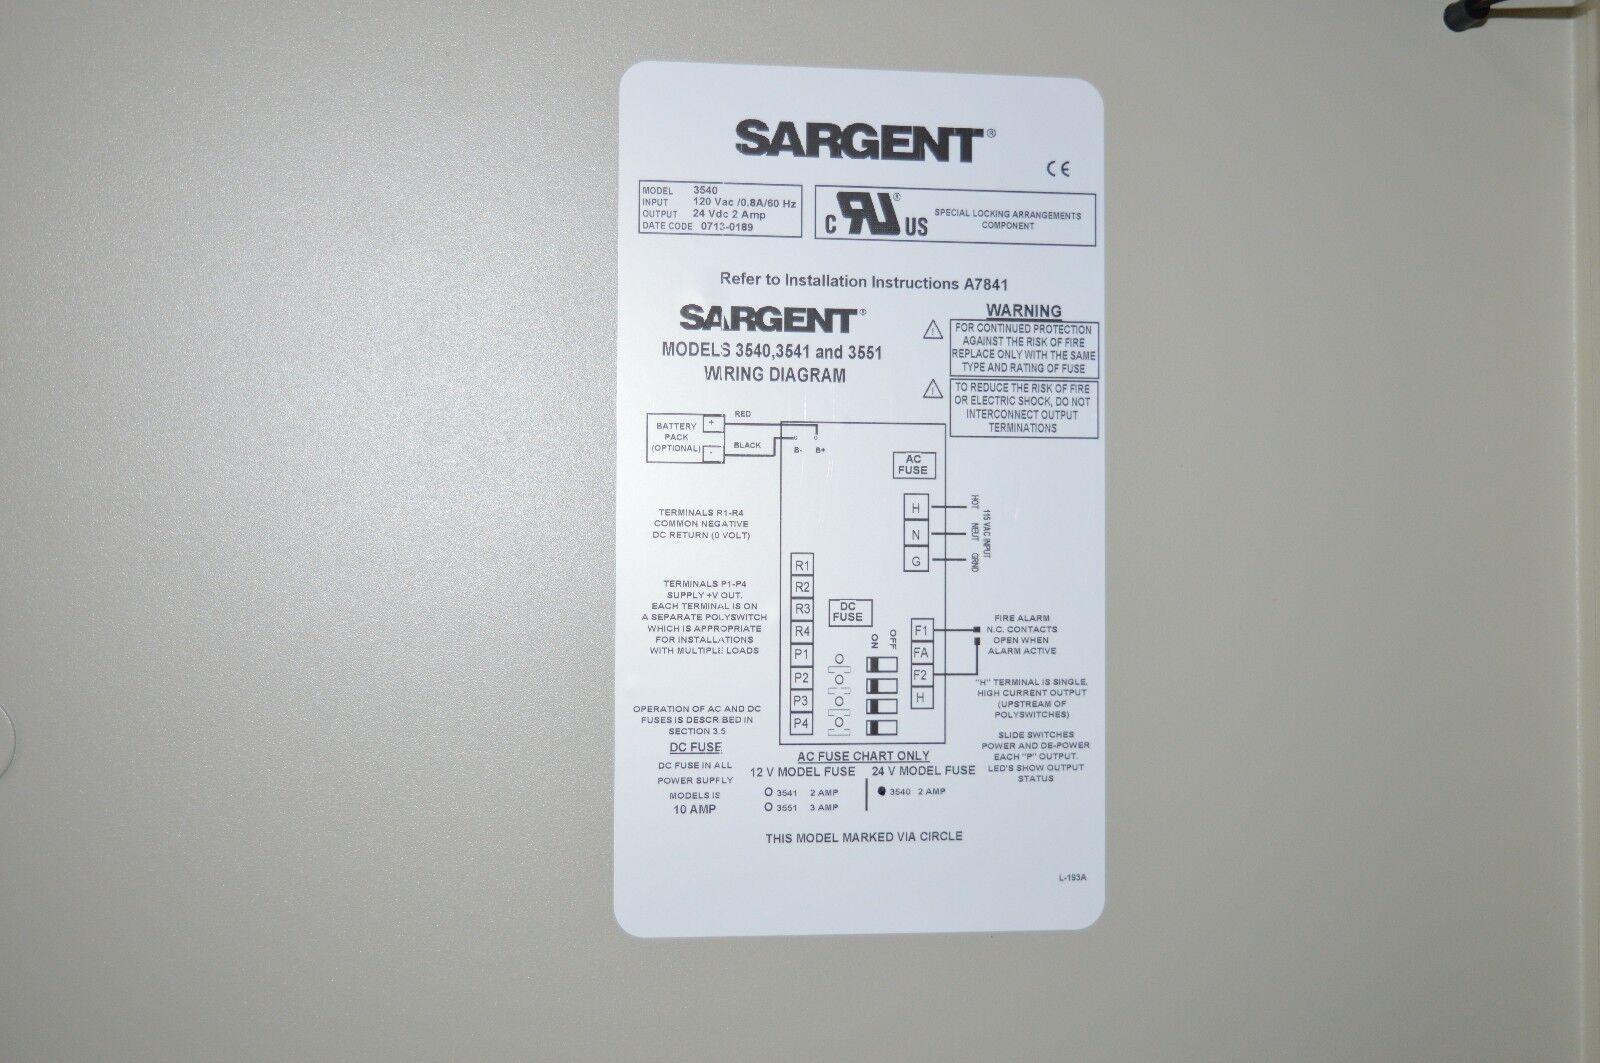 Sargent 3540 Power Supply 52 3373 2 Amp 24 Volt Ebay Wiring Diagrams By Locks Norton Secured Powered Verisign